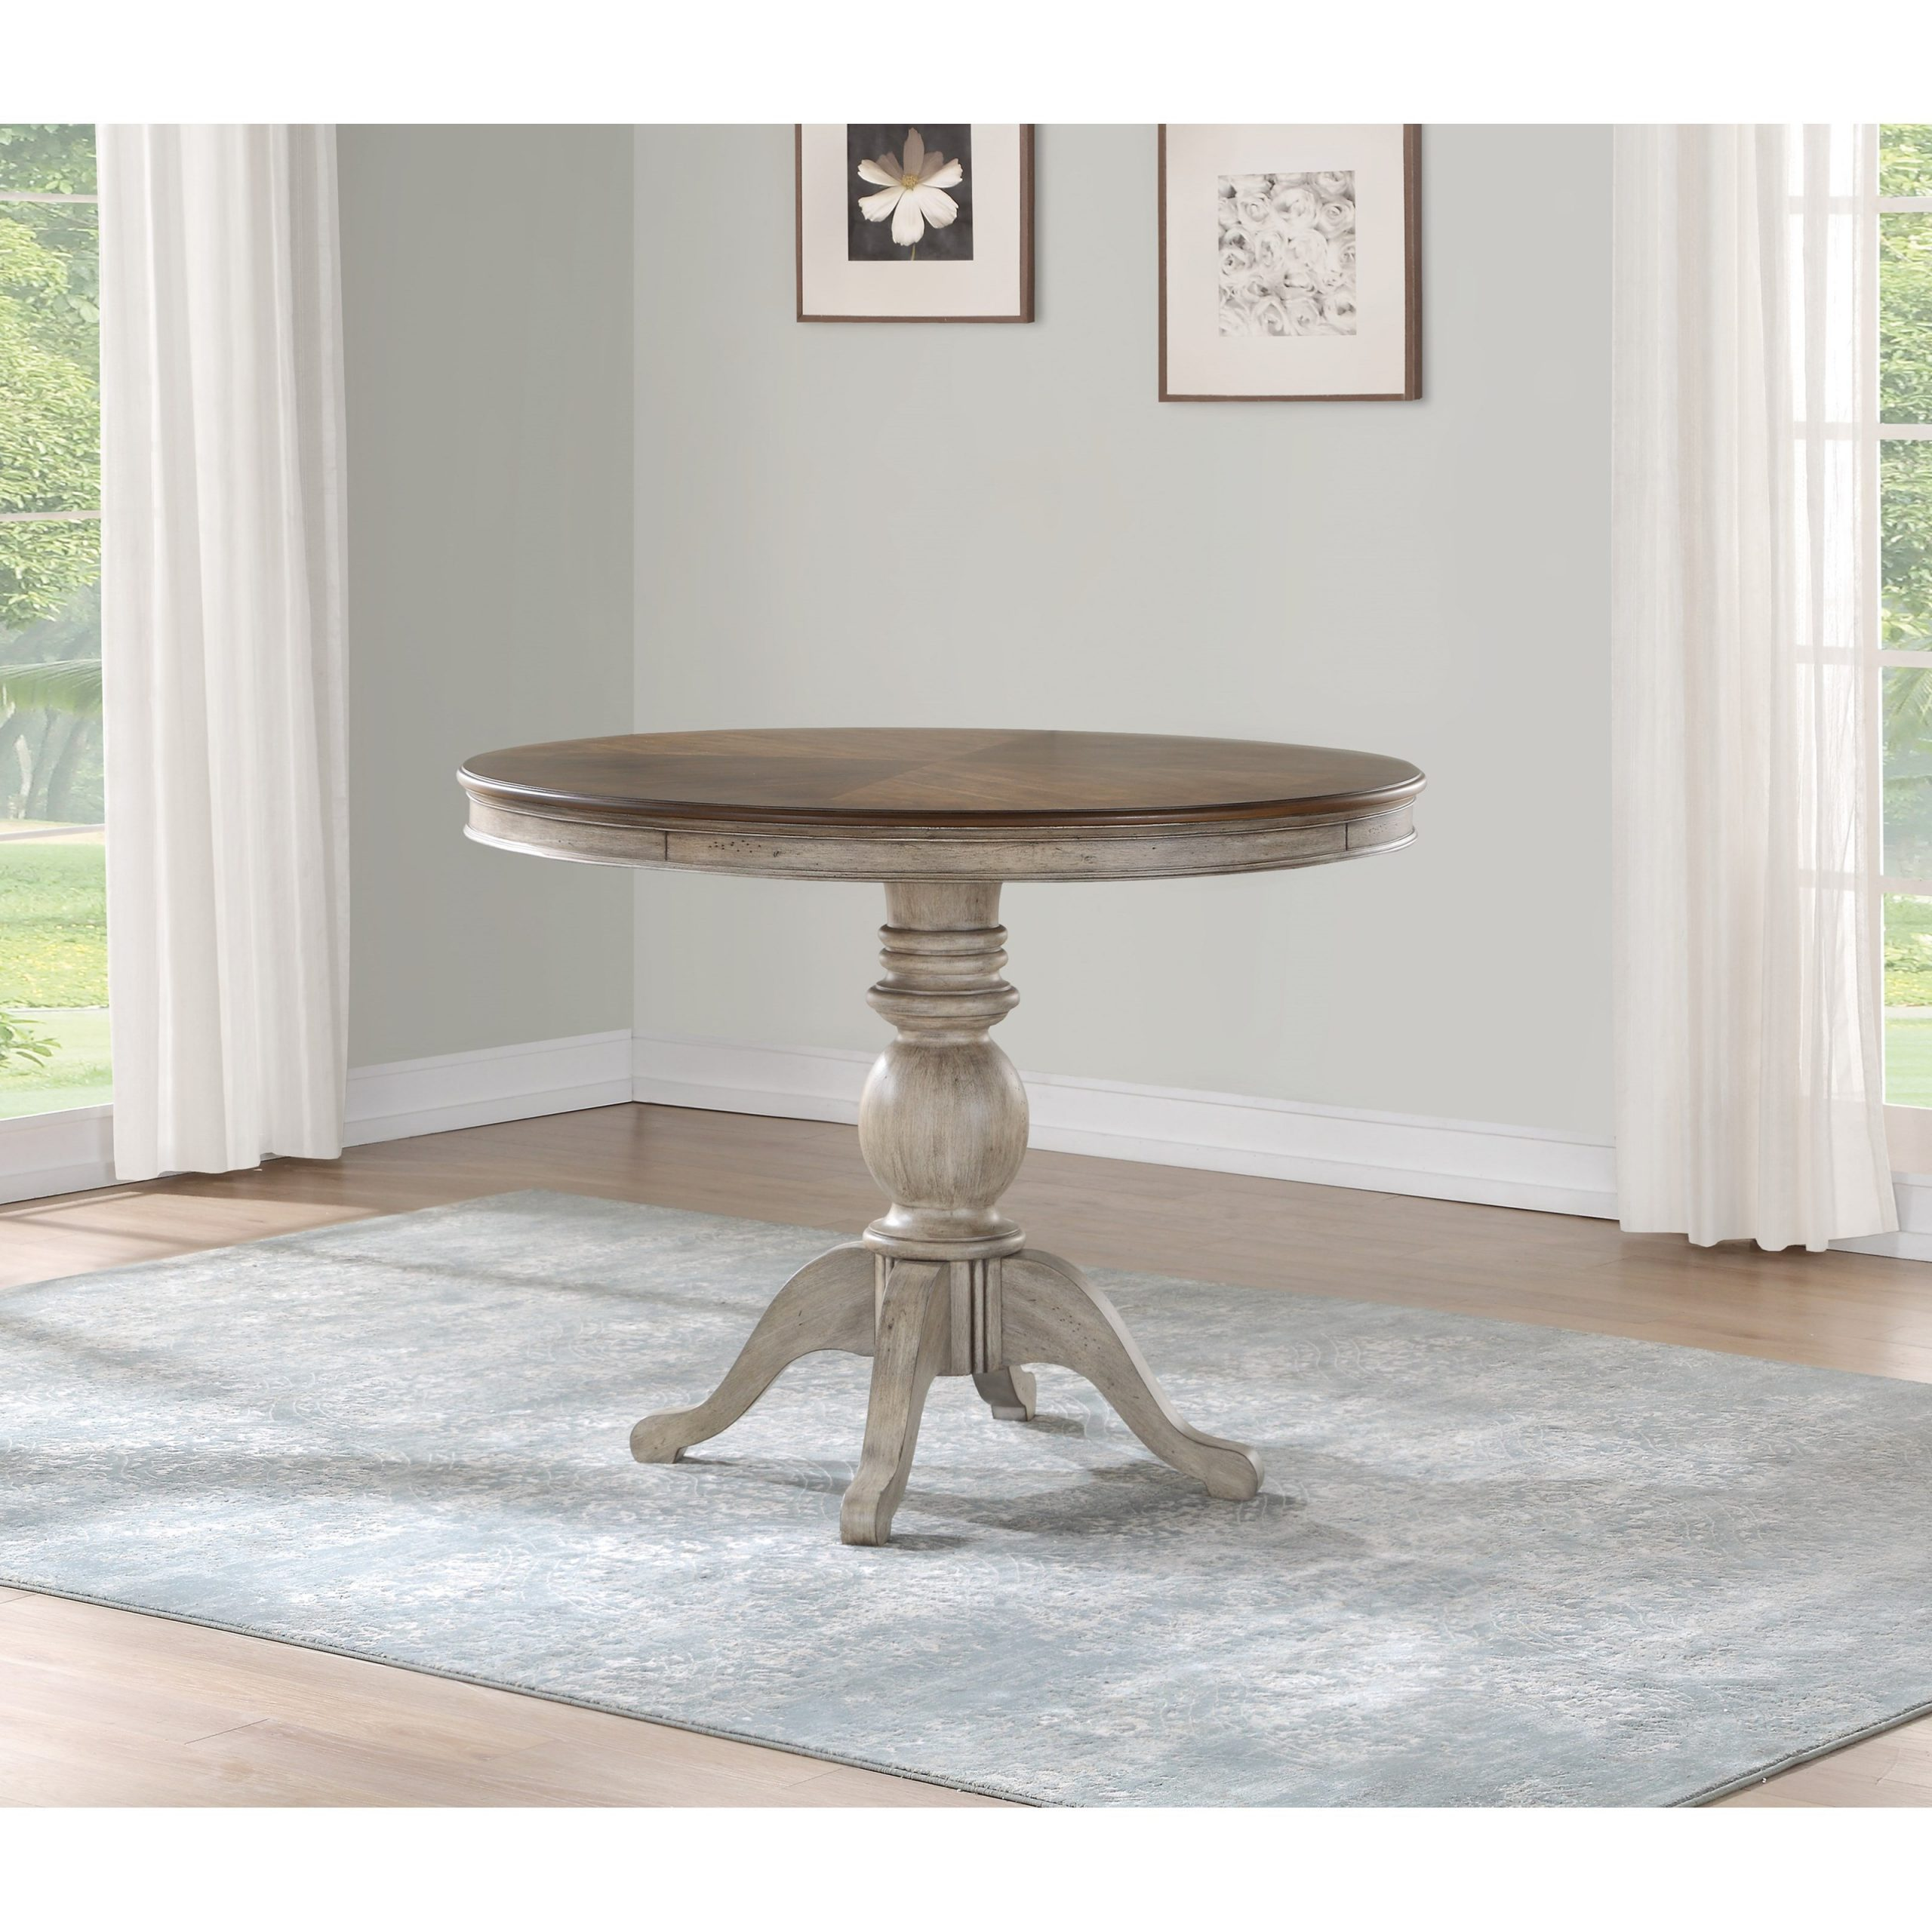 Flexsteel Ventura Relaxed Vintage Pedestal Counter Height Regarding Recent Counter Height Pedestal Dining Tables (View 12 of 15)